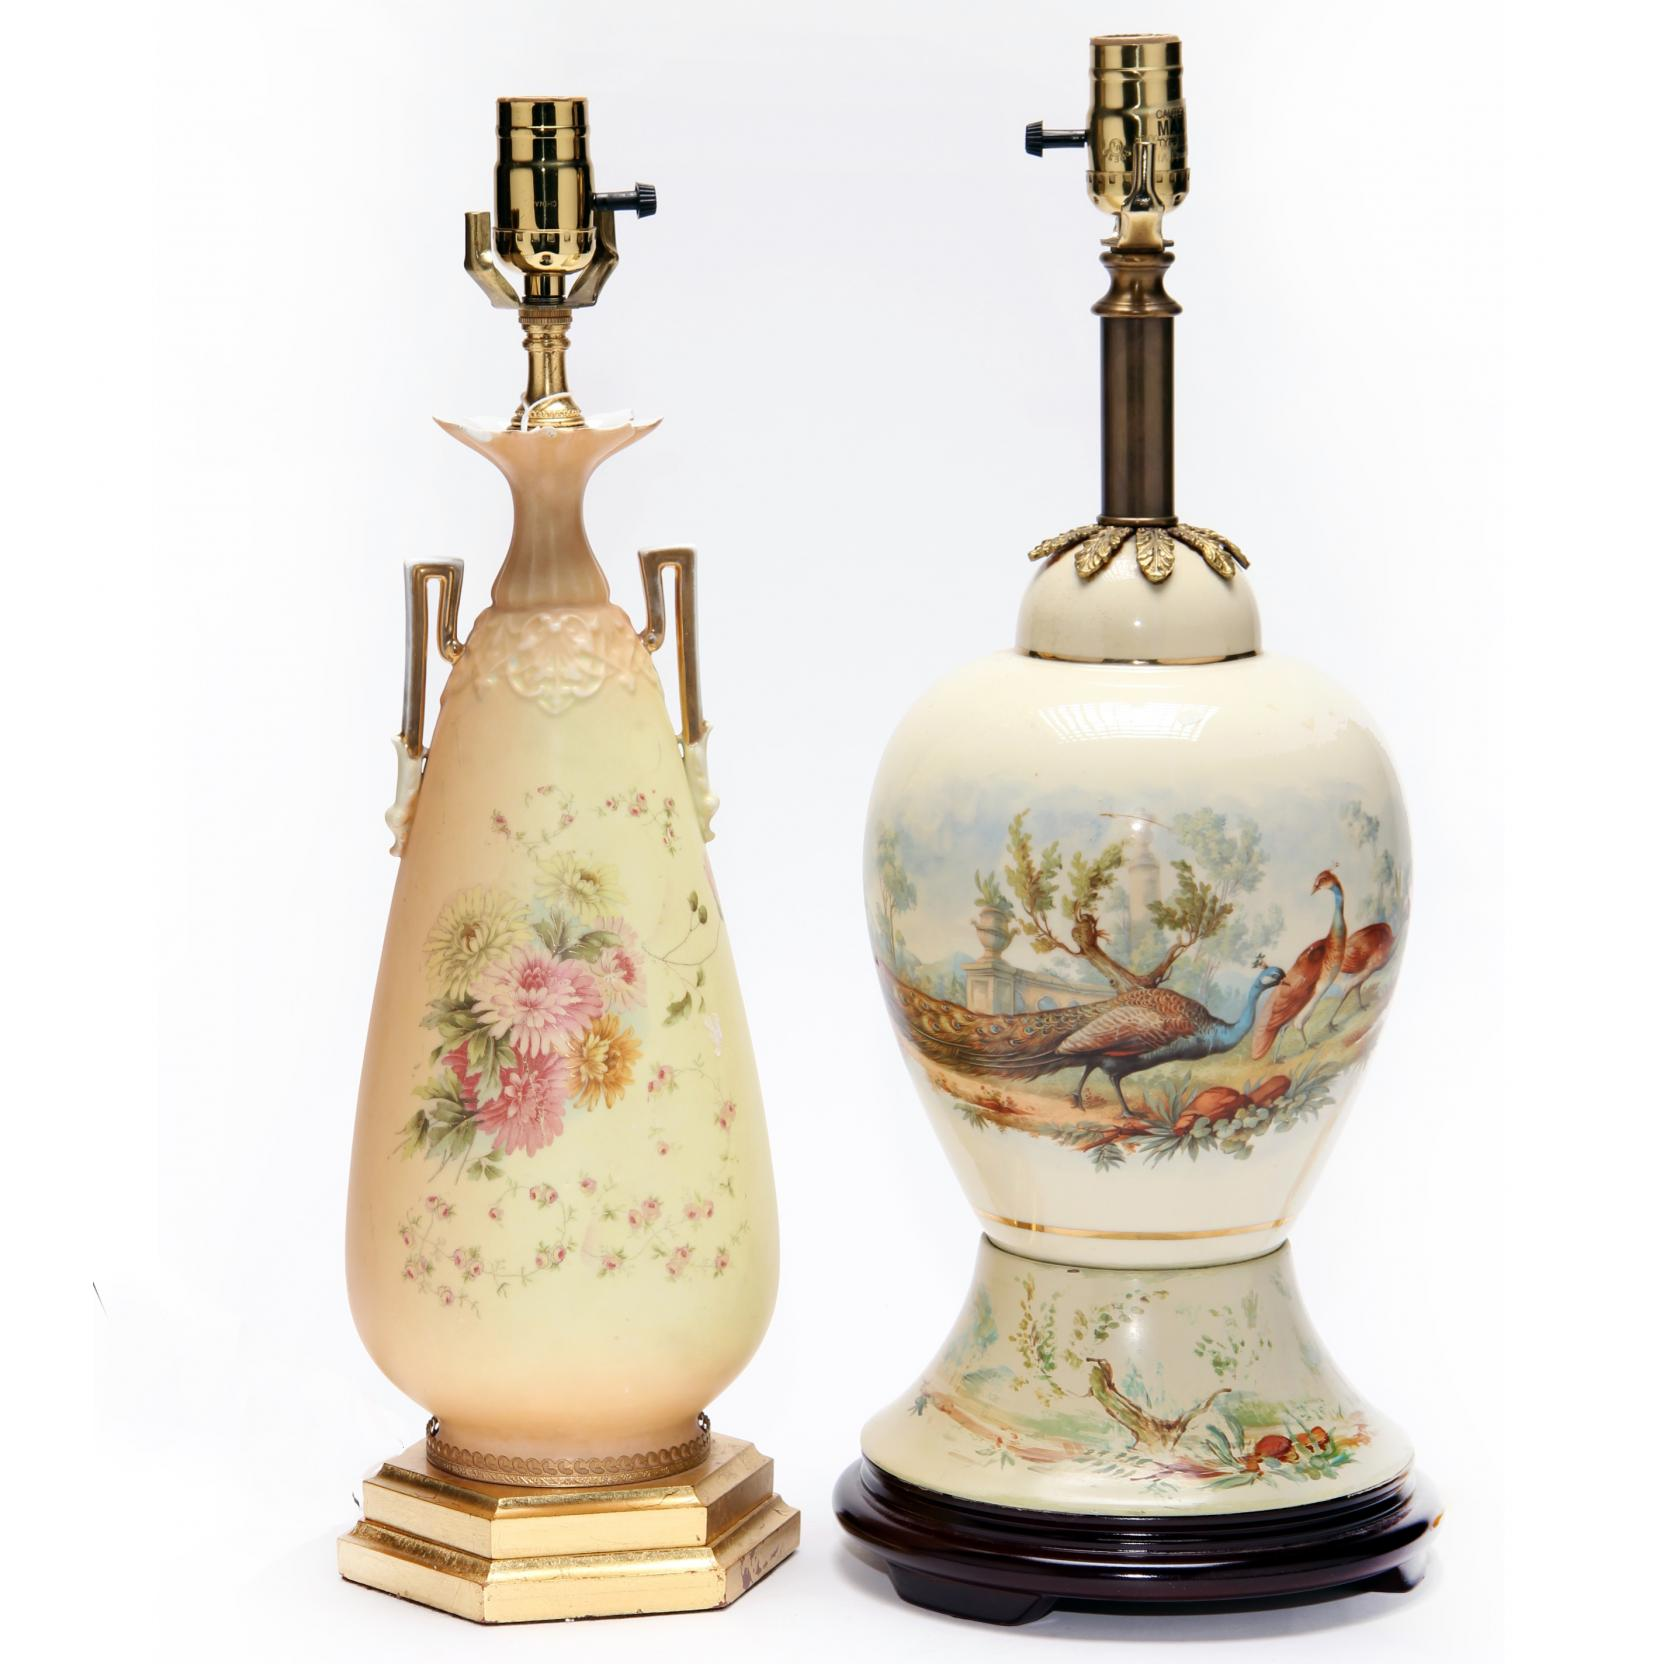 two-vintage-porcelain-table-lamps